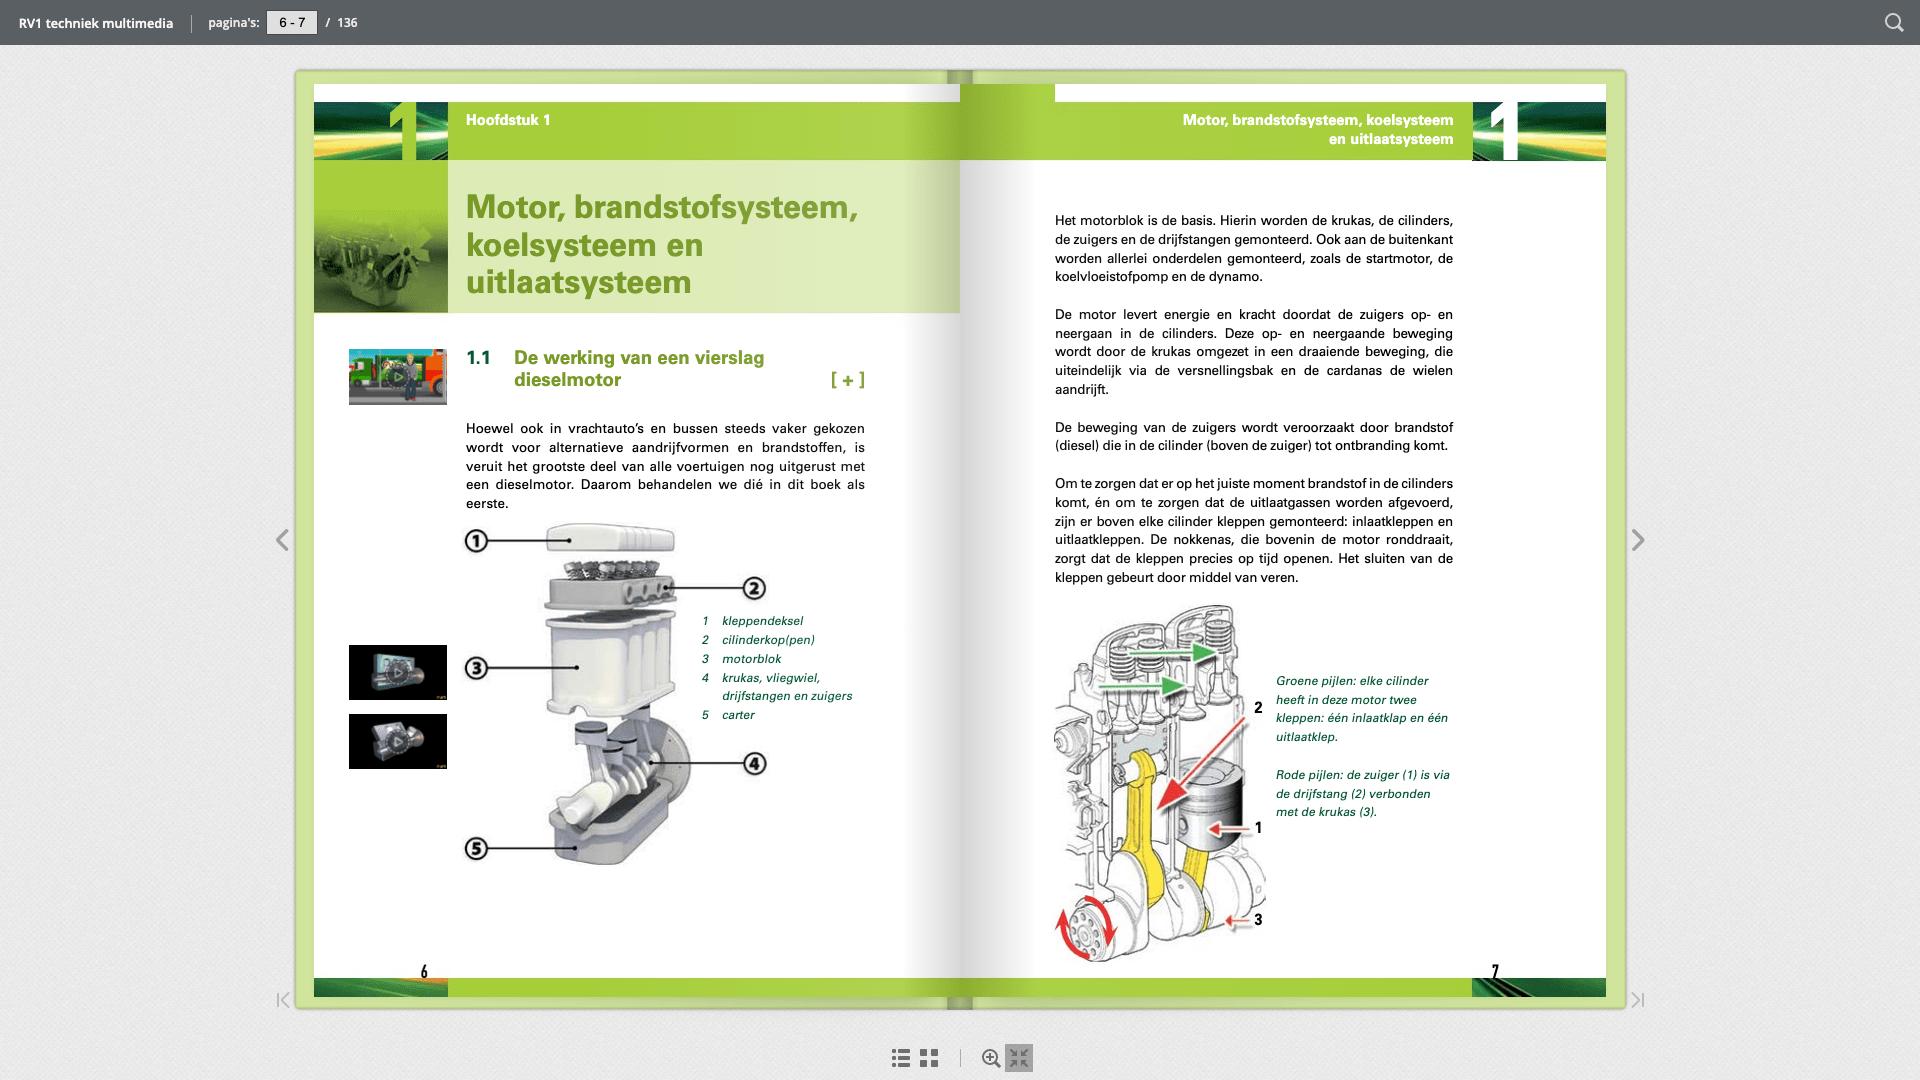 Bus Theorieboek RV1 Techniek